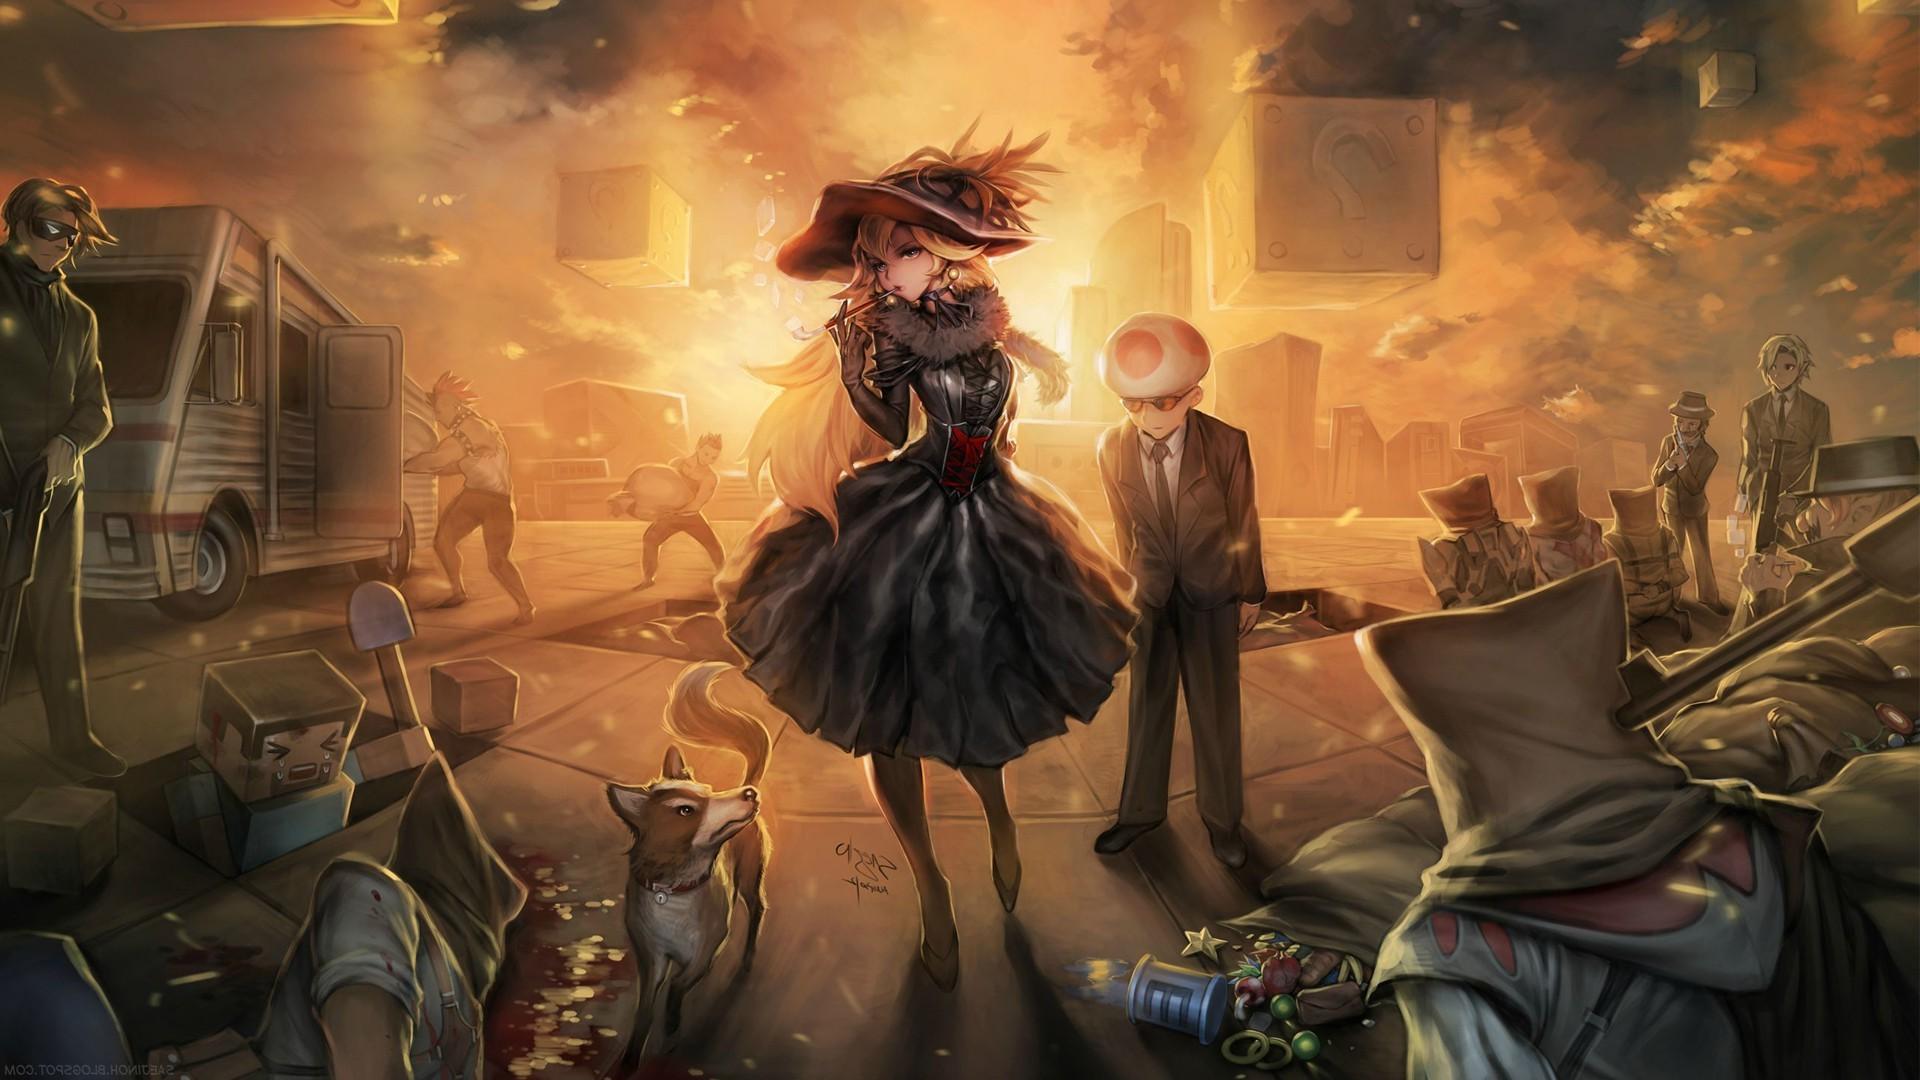 Top Wallpaper Minecraft Assassin - video-games-anime-Minecraft-Princess-Peach-mythology-games-screenshot-warlord-1920x1080-px-assassins-creed-computer-wallpaper-pc-game-717162  Collection_727755.jpg